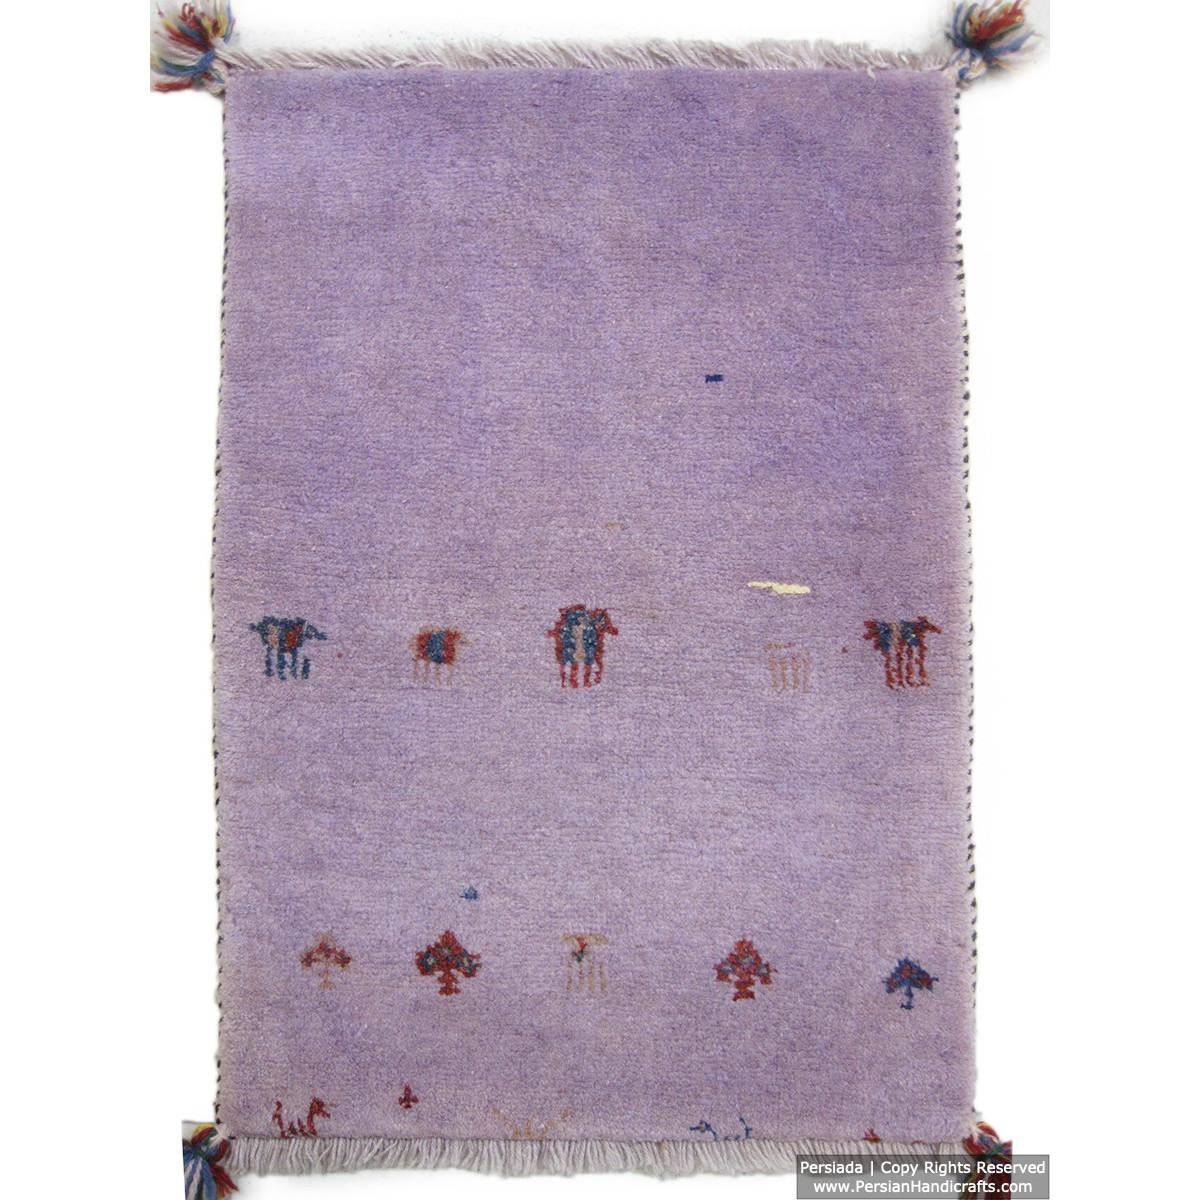 Gabbeh Wool Rug from Persian Ghashghai Nomads - RG5023-Persian Handicrafts